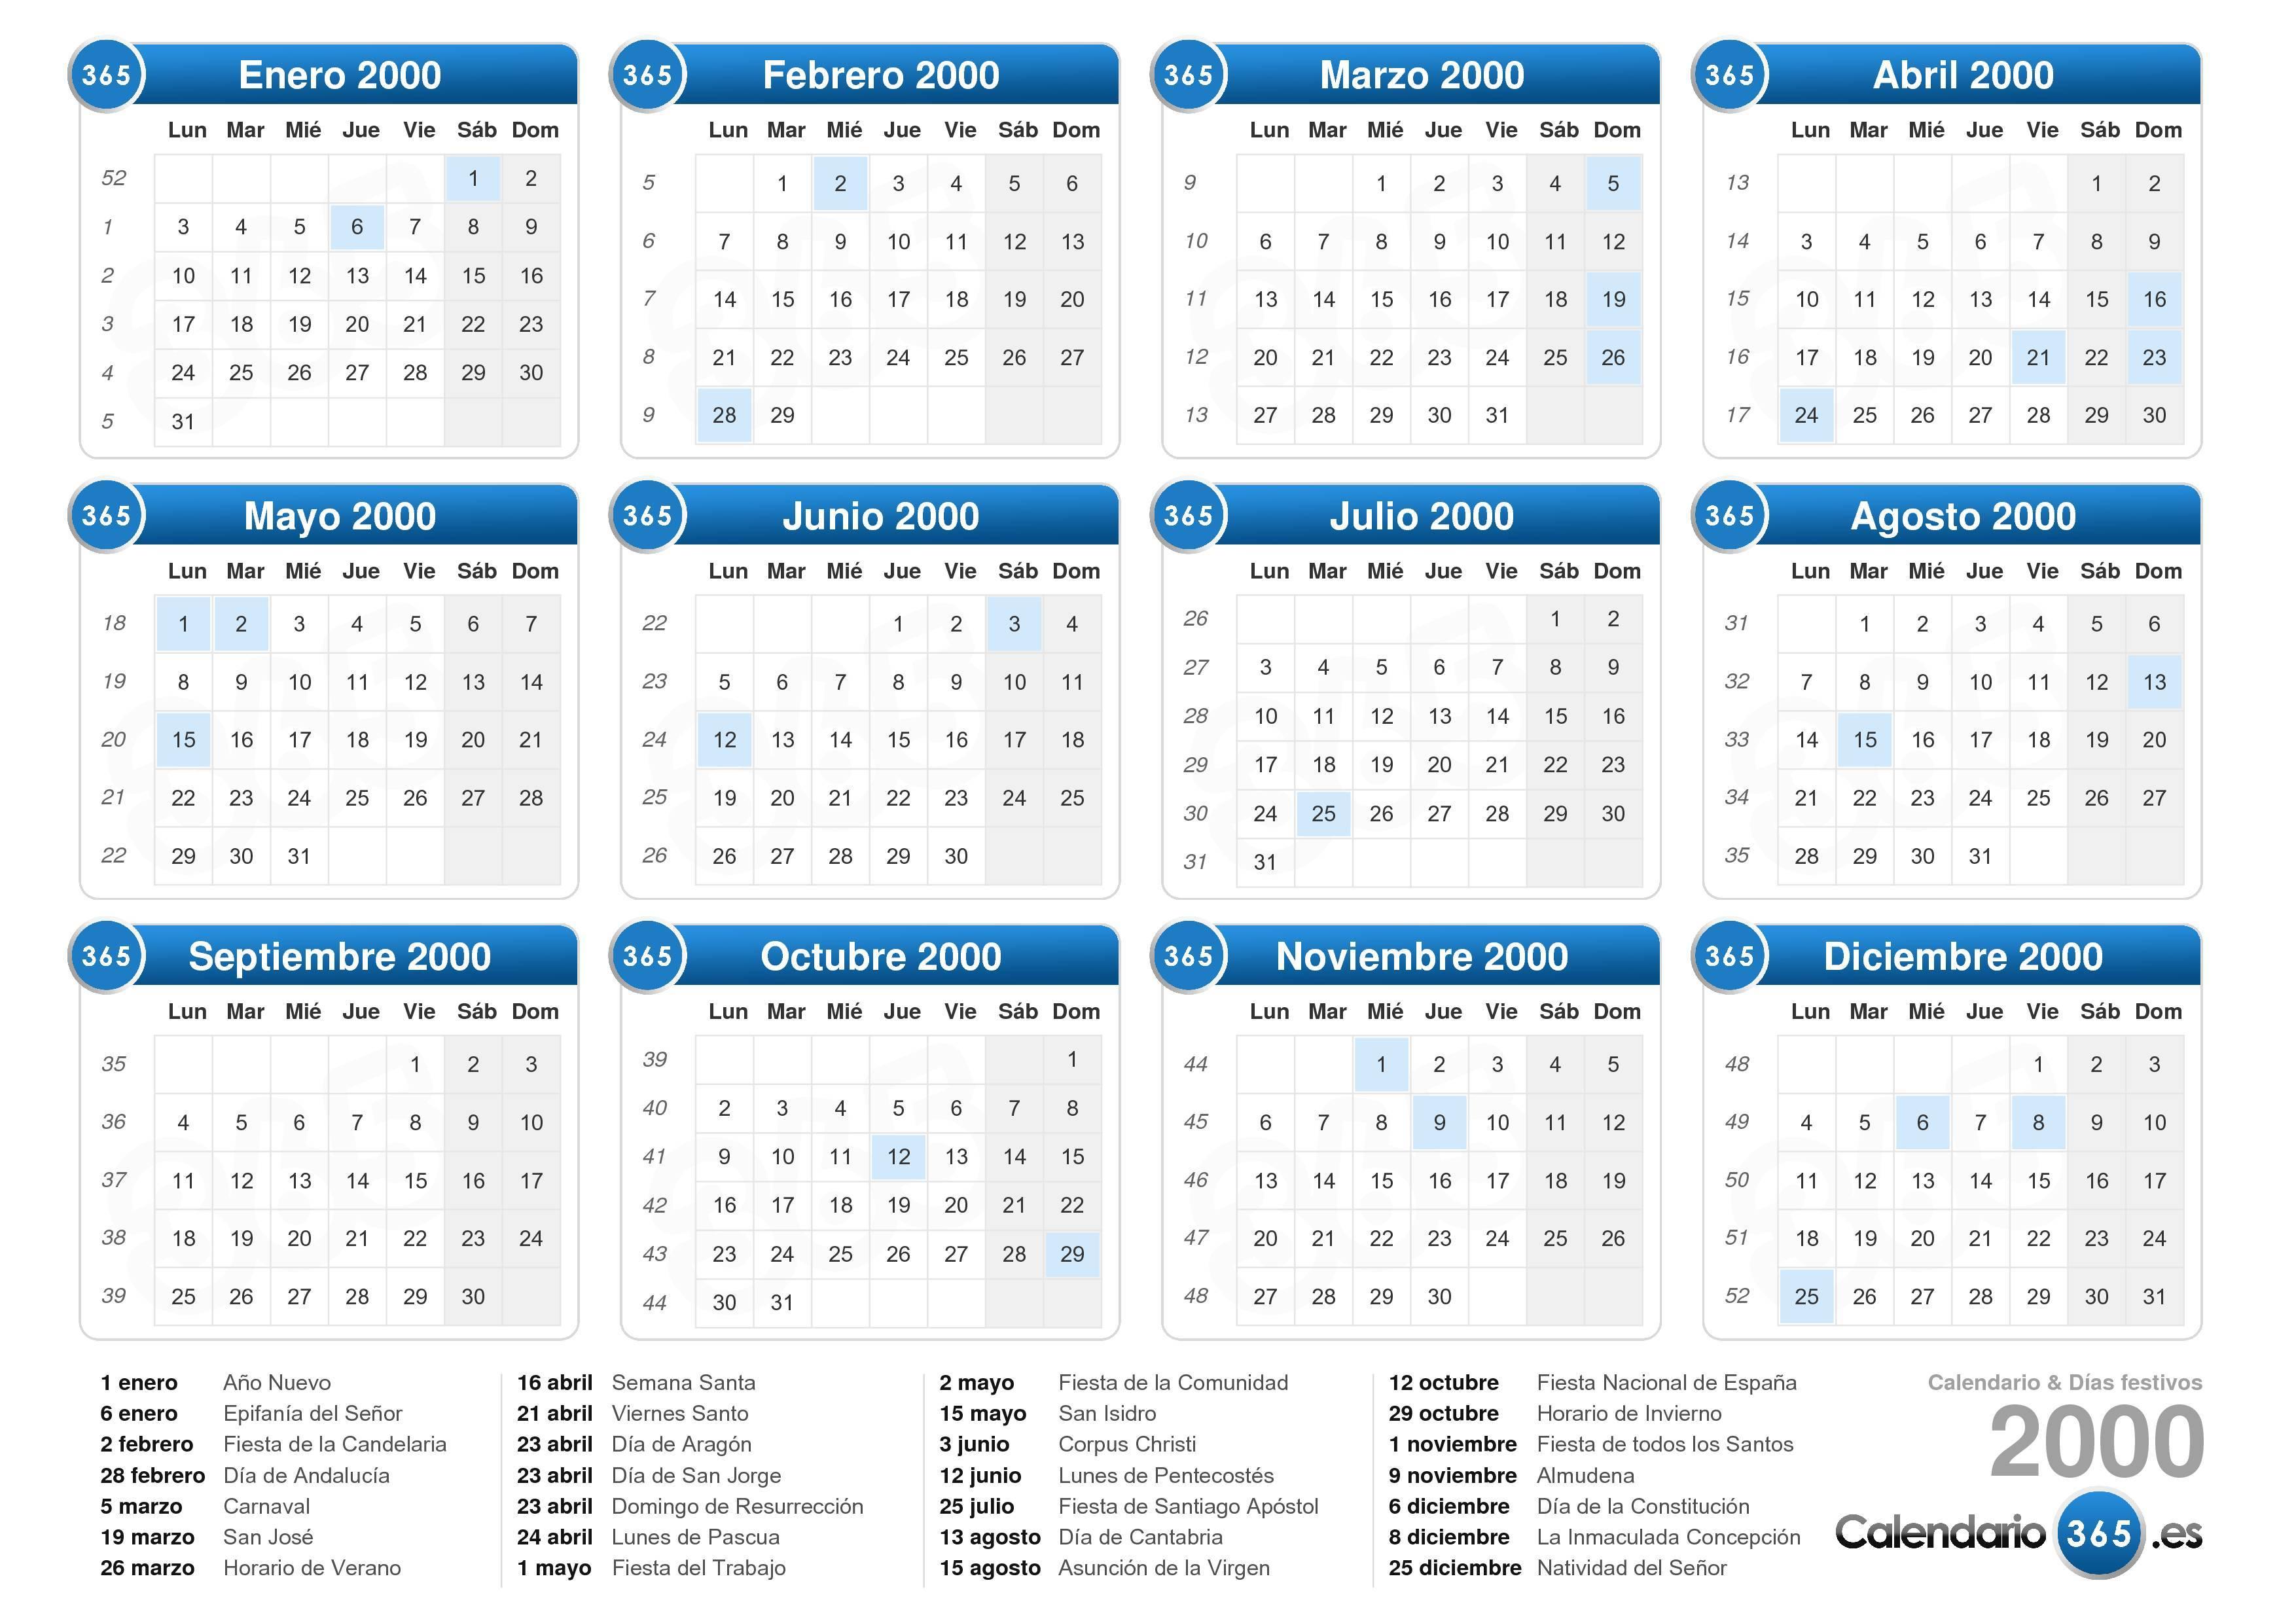 Calendario Del 2000.Calendario 2000